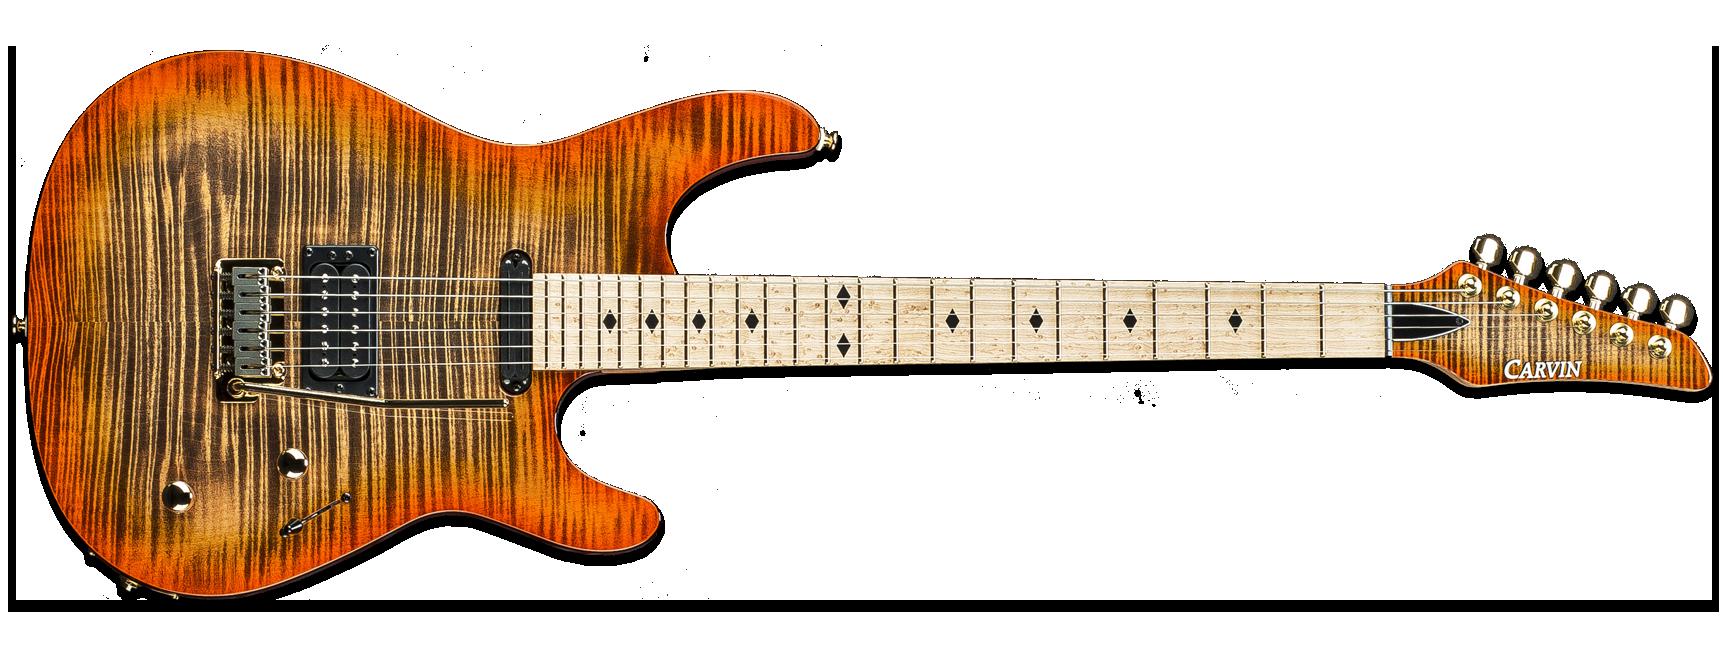 Kiesel Carvin GH24 Greg Howe Carvin, Signature guitar